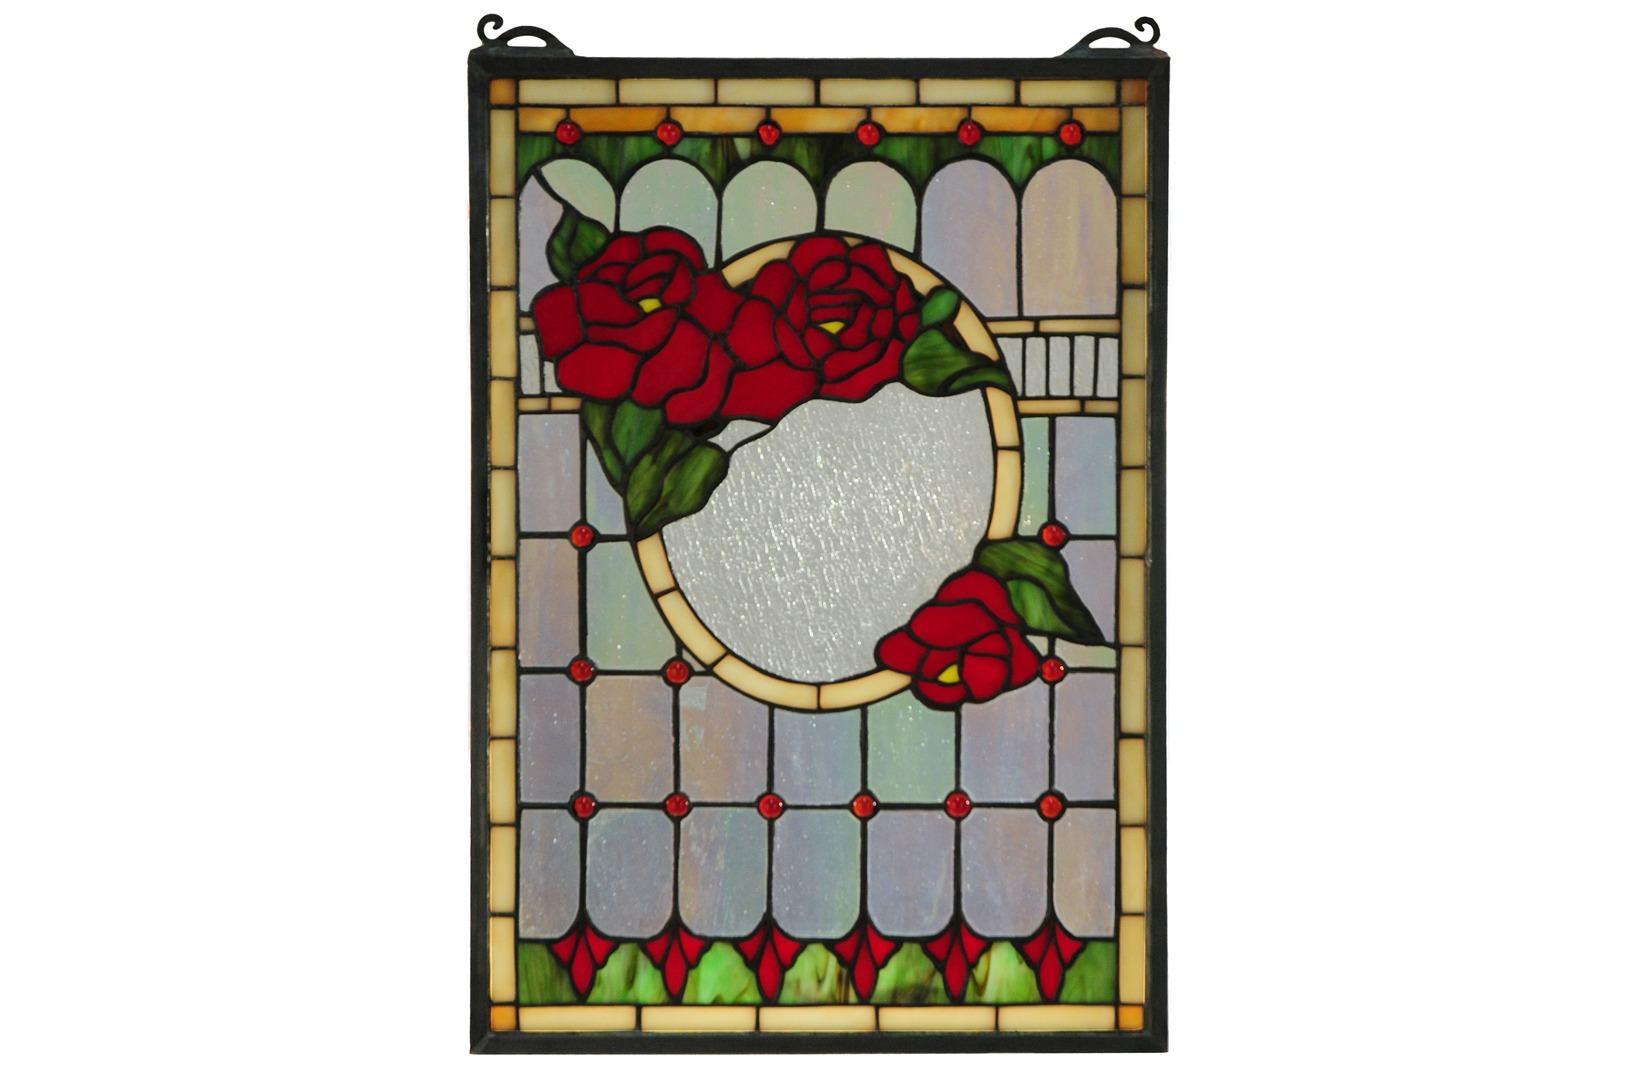 TIFFANY STYLE WINDOW 1